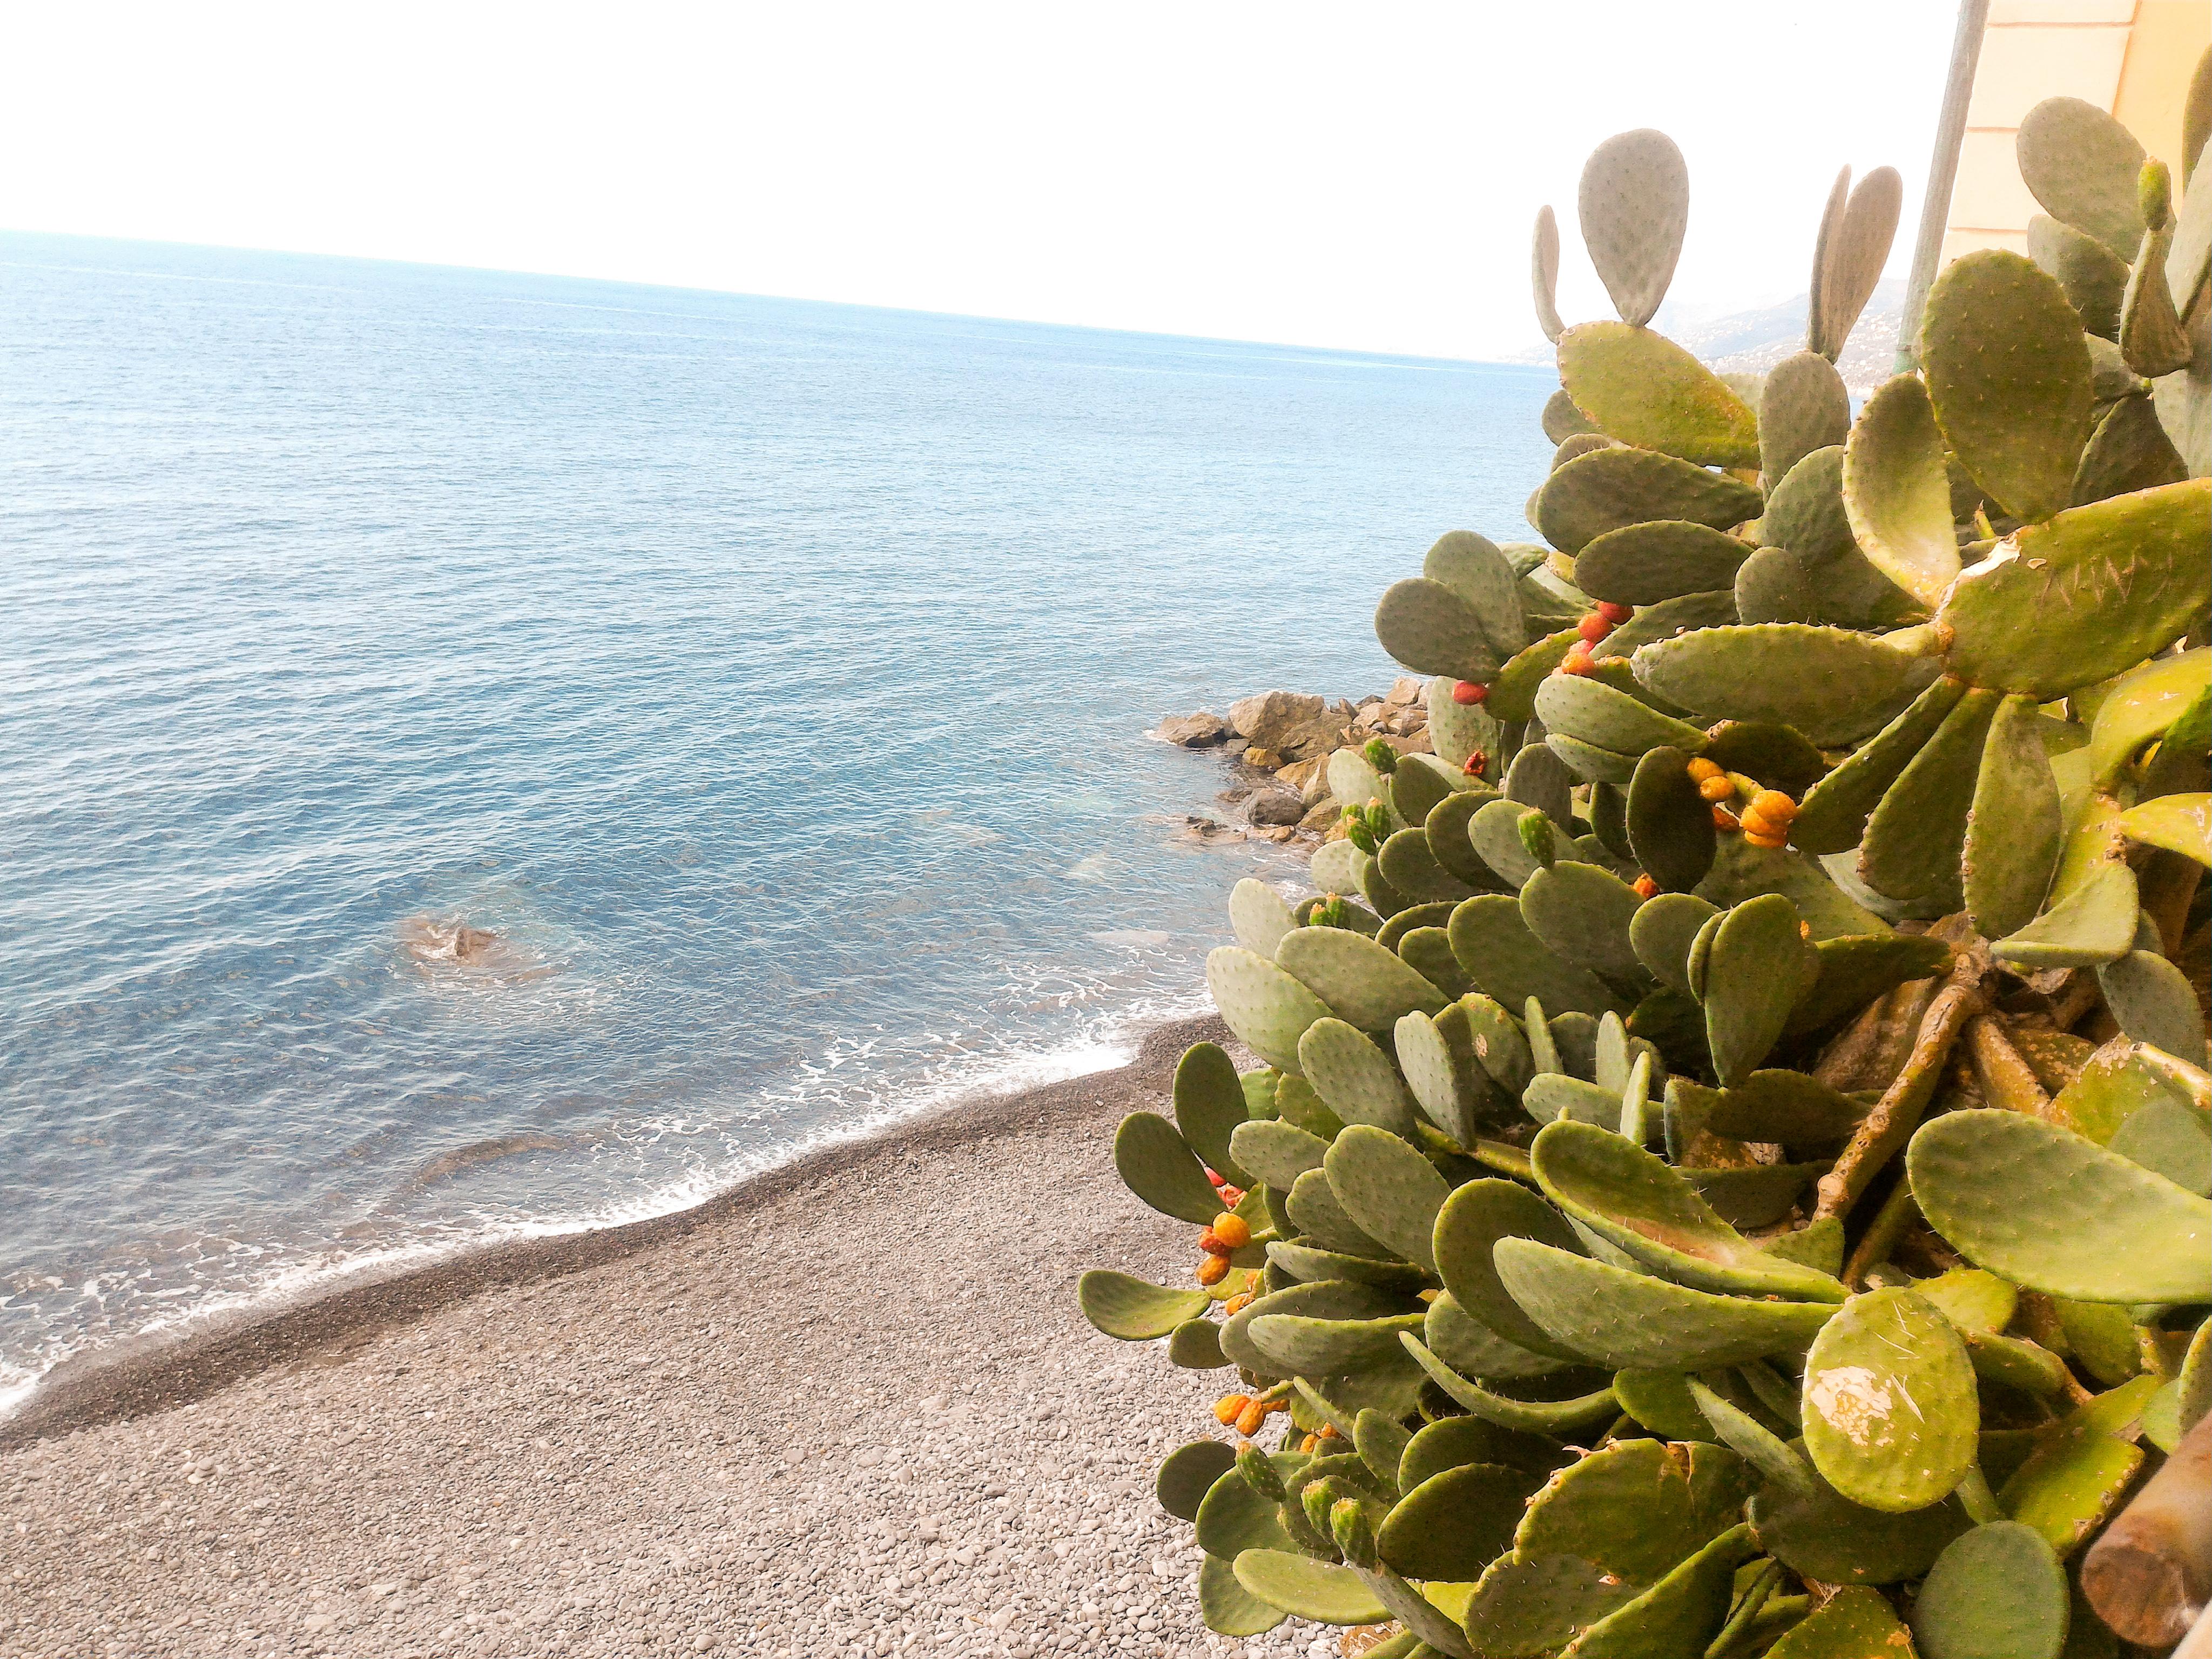 liguria tenger2